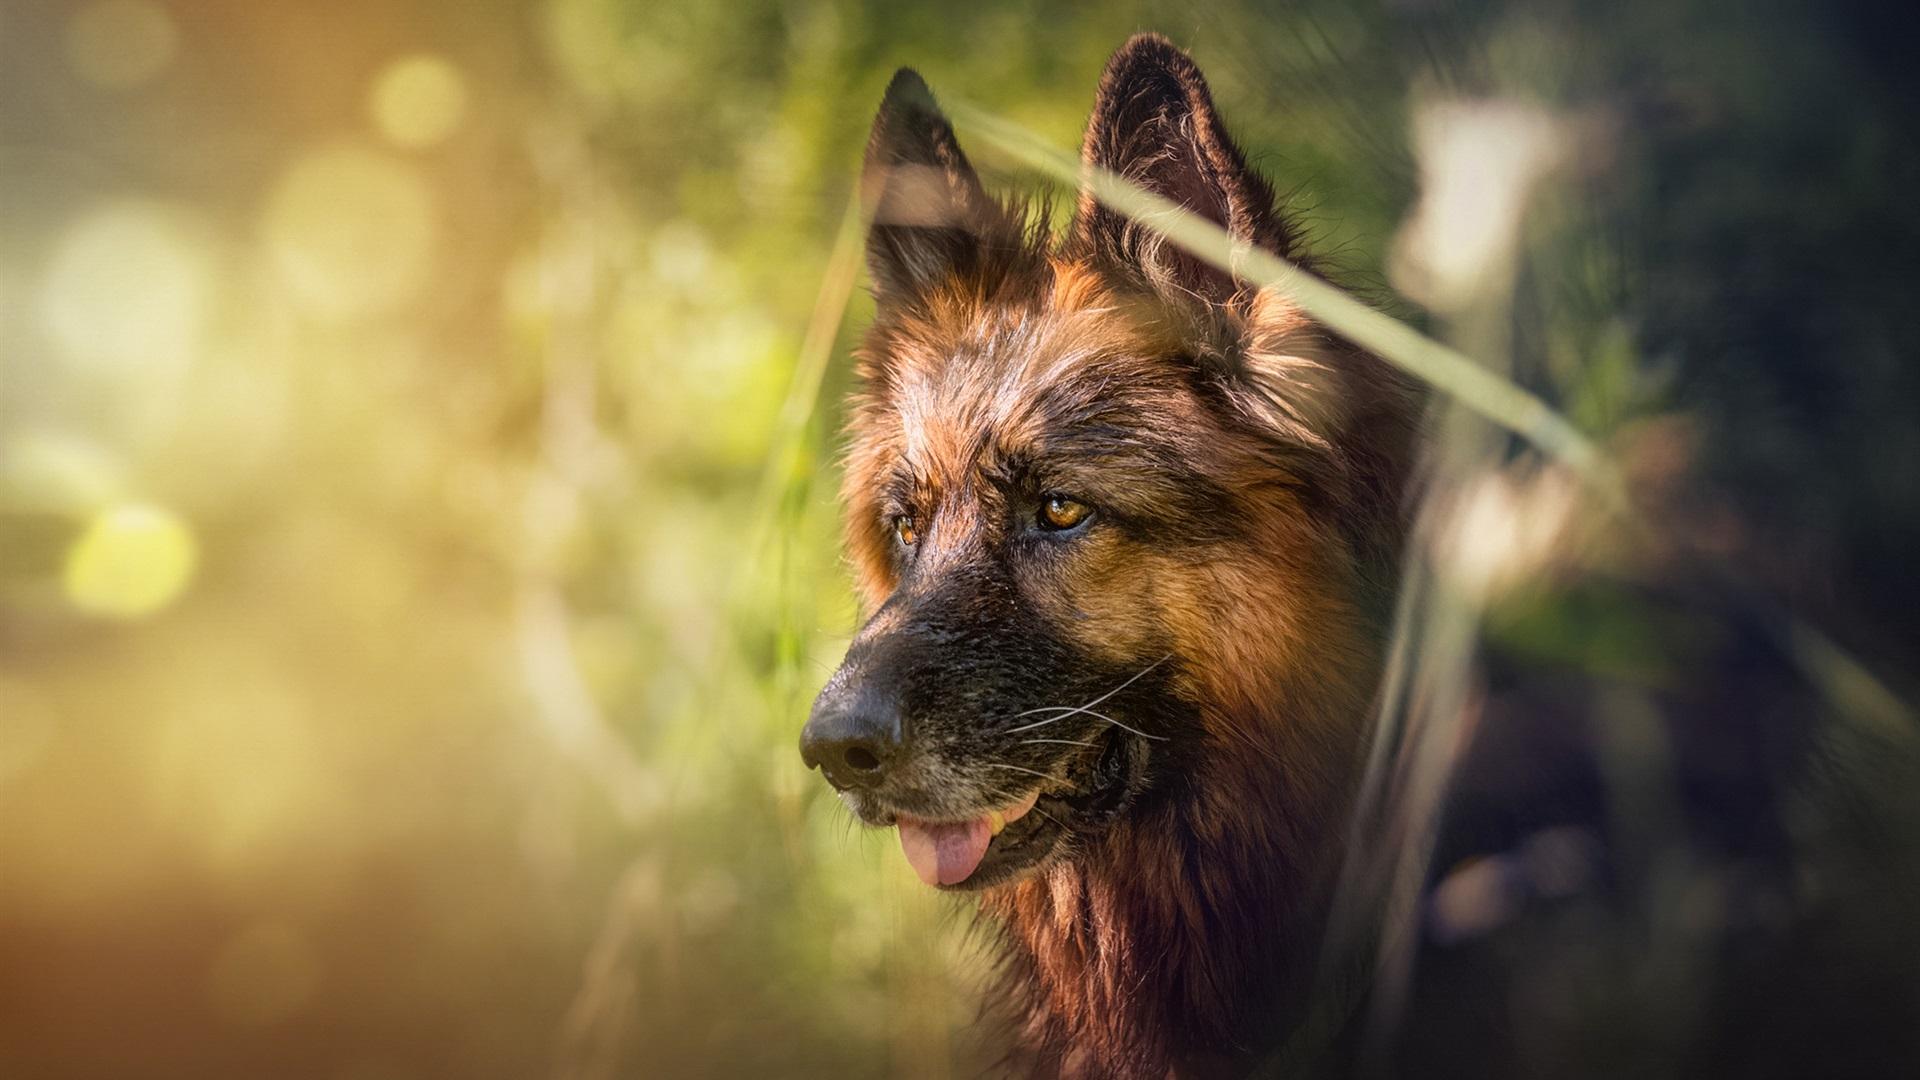 German shepherd, face, blurry Wallpaper | 1920x1080 Full ... Hd Wallpaper 1920x1080 Free Download